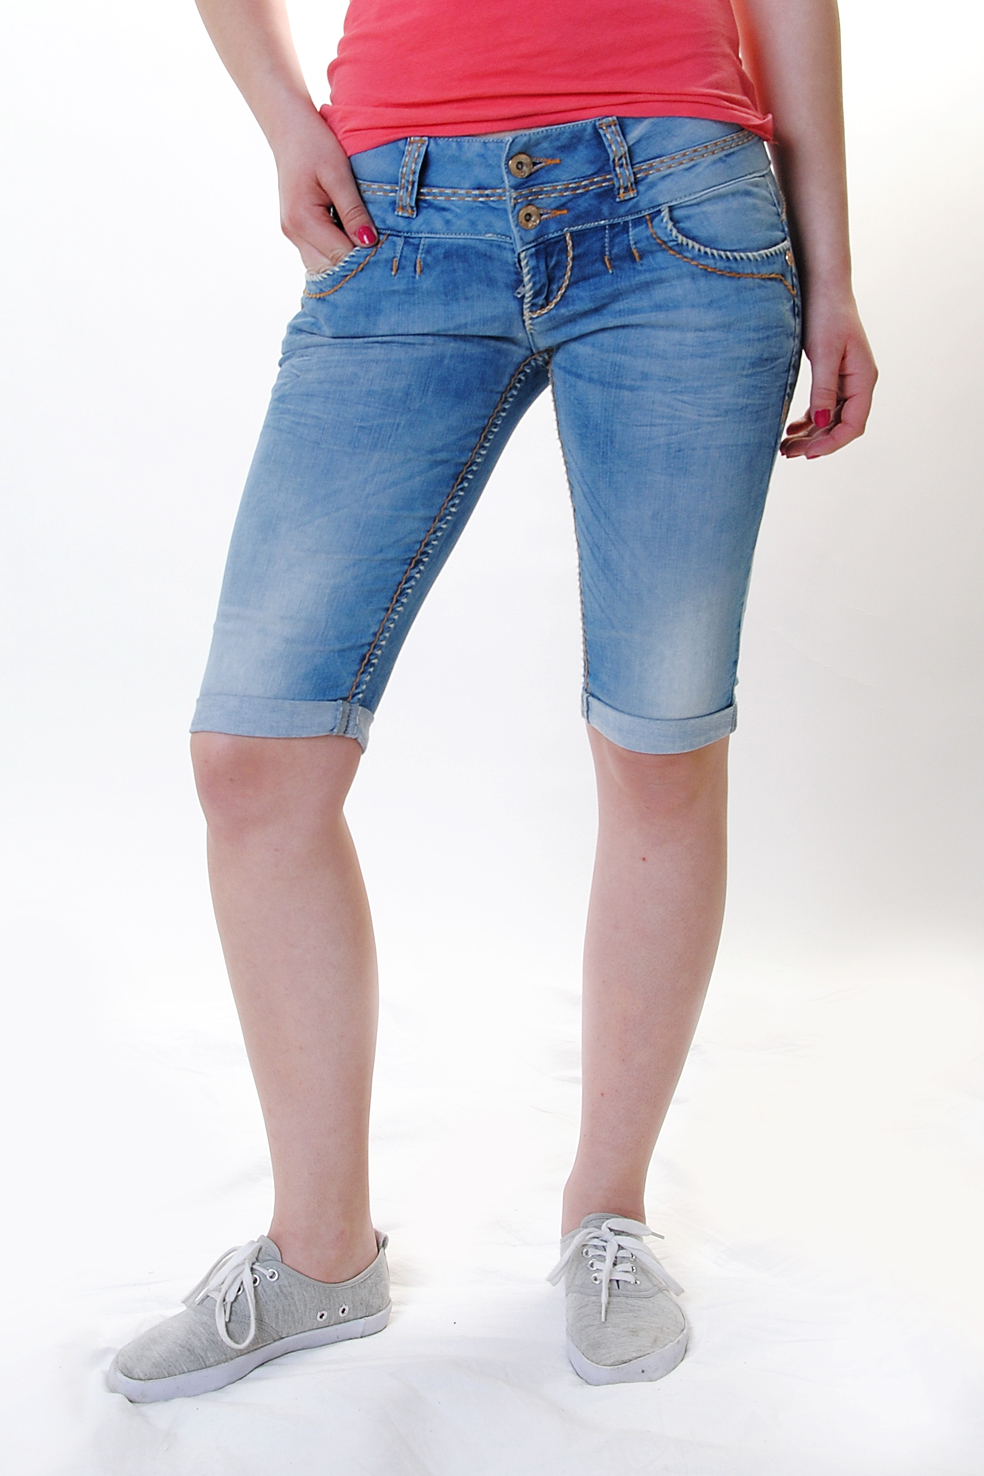 cipo baxx damen capri jeans cbw 0621 ebay. Black Bedroom Furniture Sets. Home Design Ideas